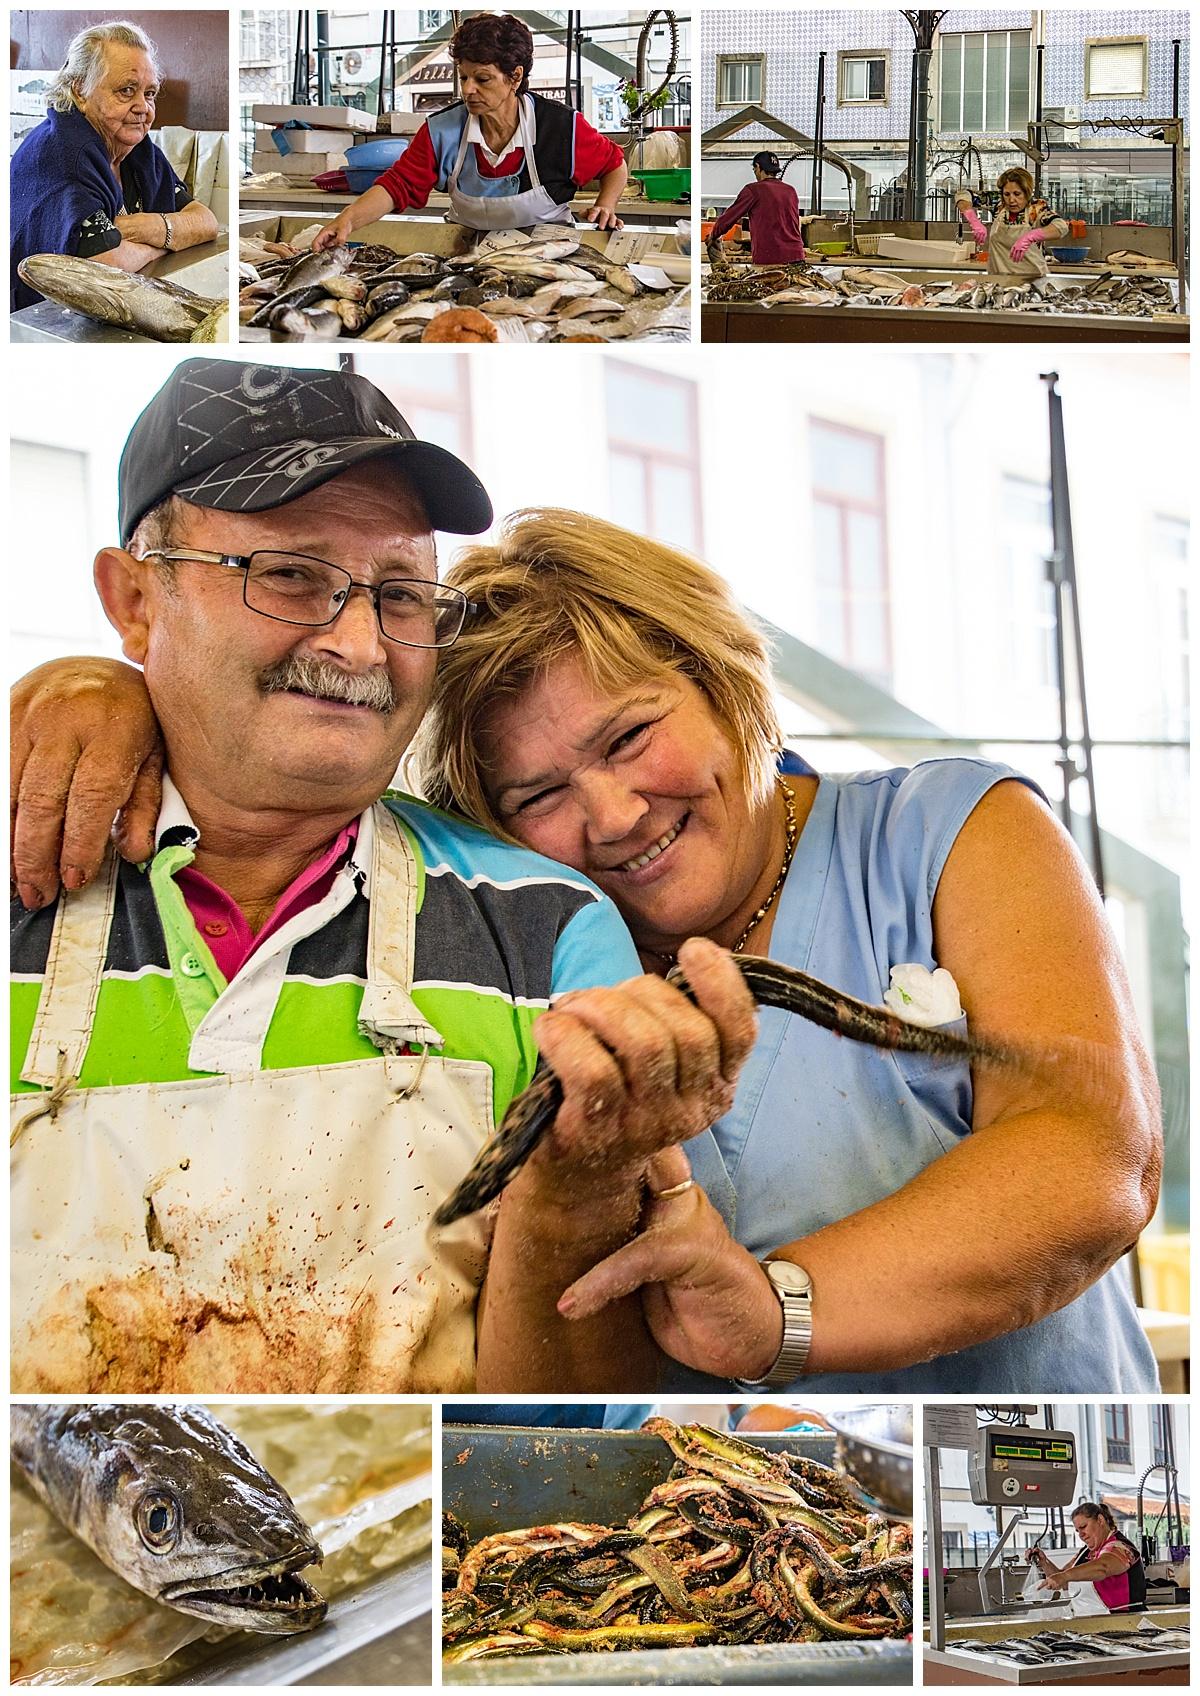 Aveiro 1 - fish market